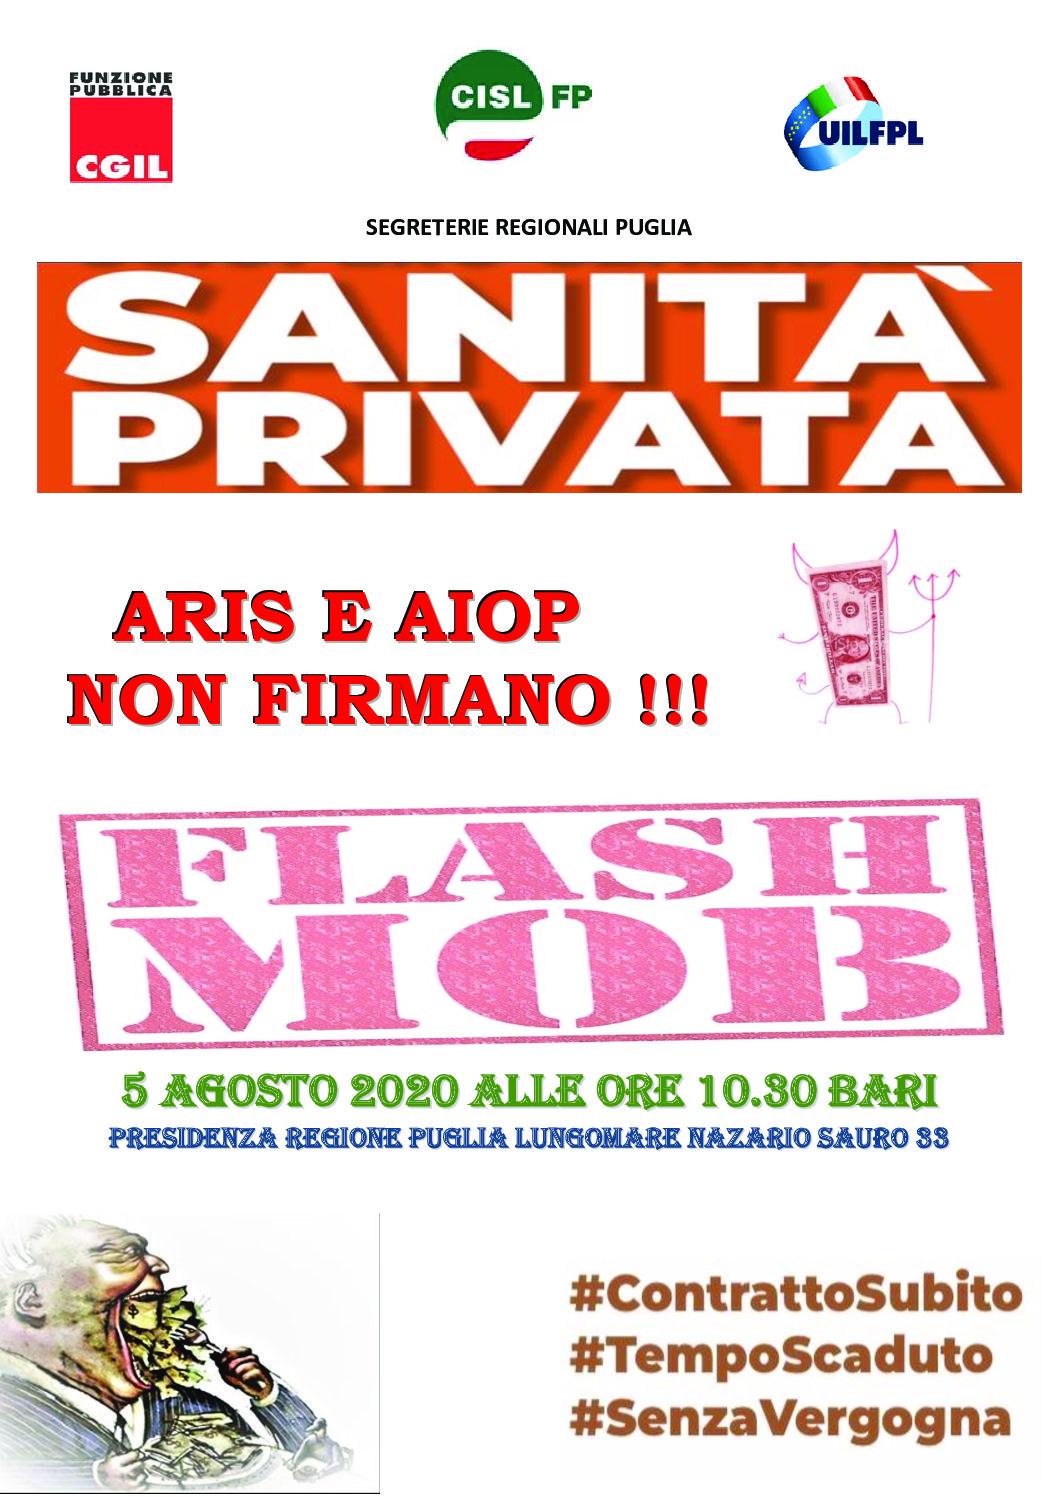 Vertenza Sanità Privata CCNL AIOP-ARIS – Flash Mob di FP CGIL, CISL FP e UIL FPL Puglia